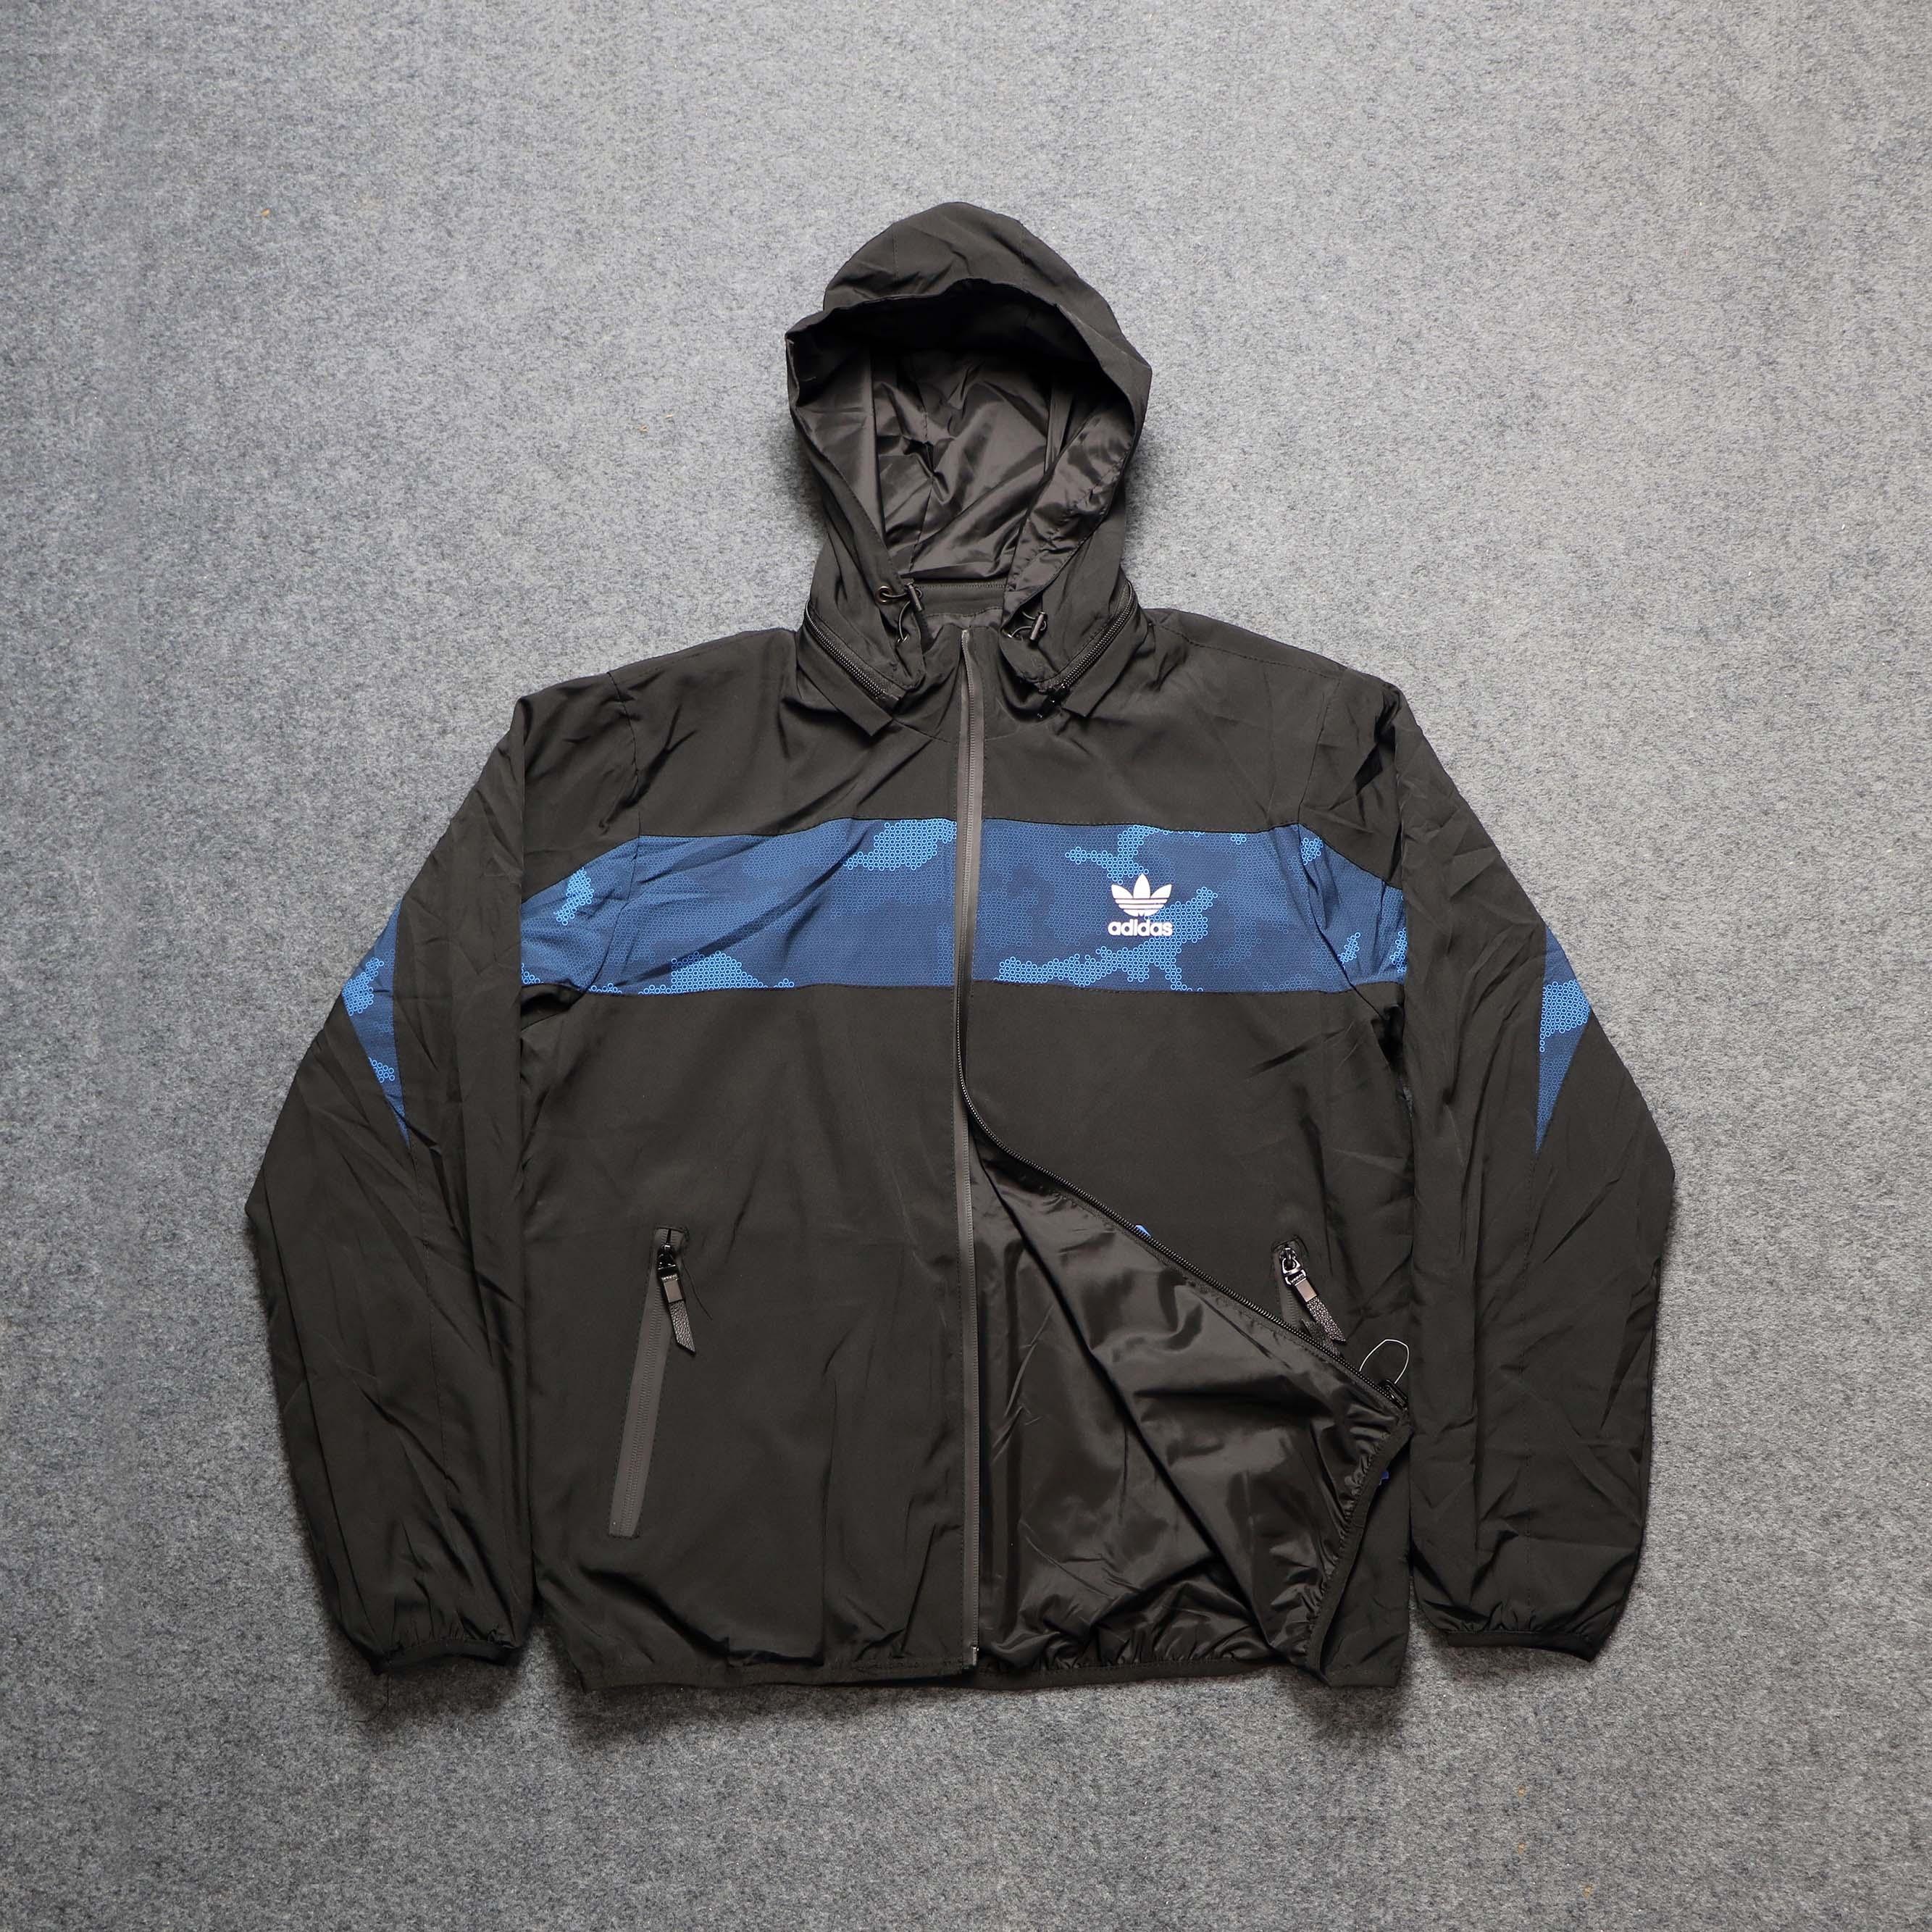 Double Part Hoodie Jacket